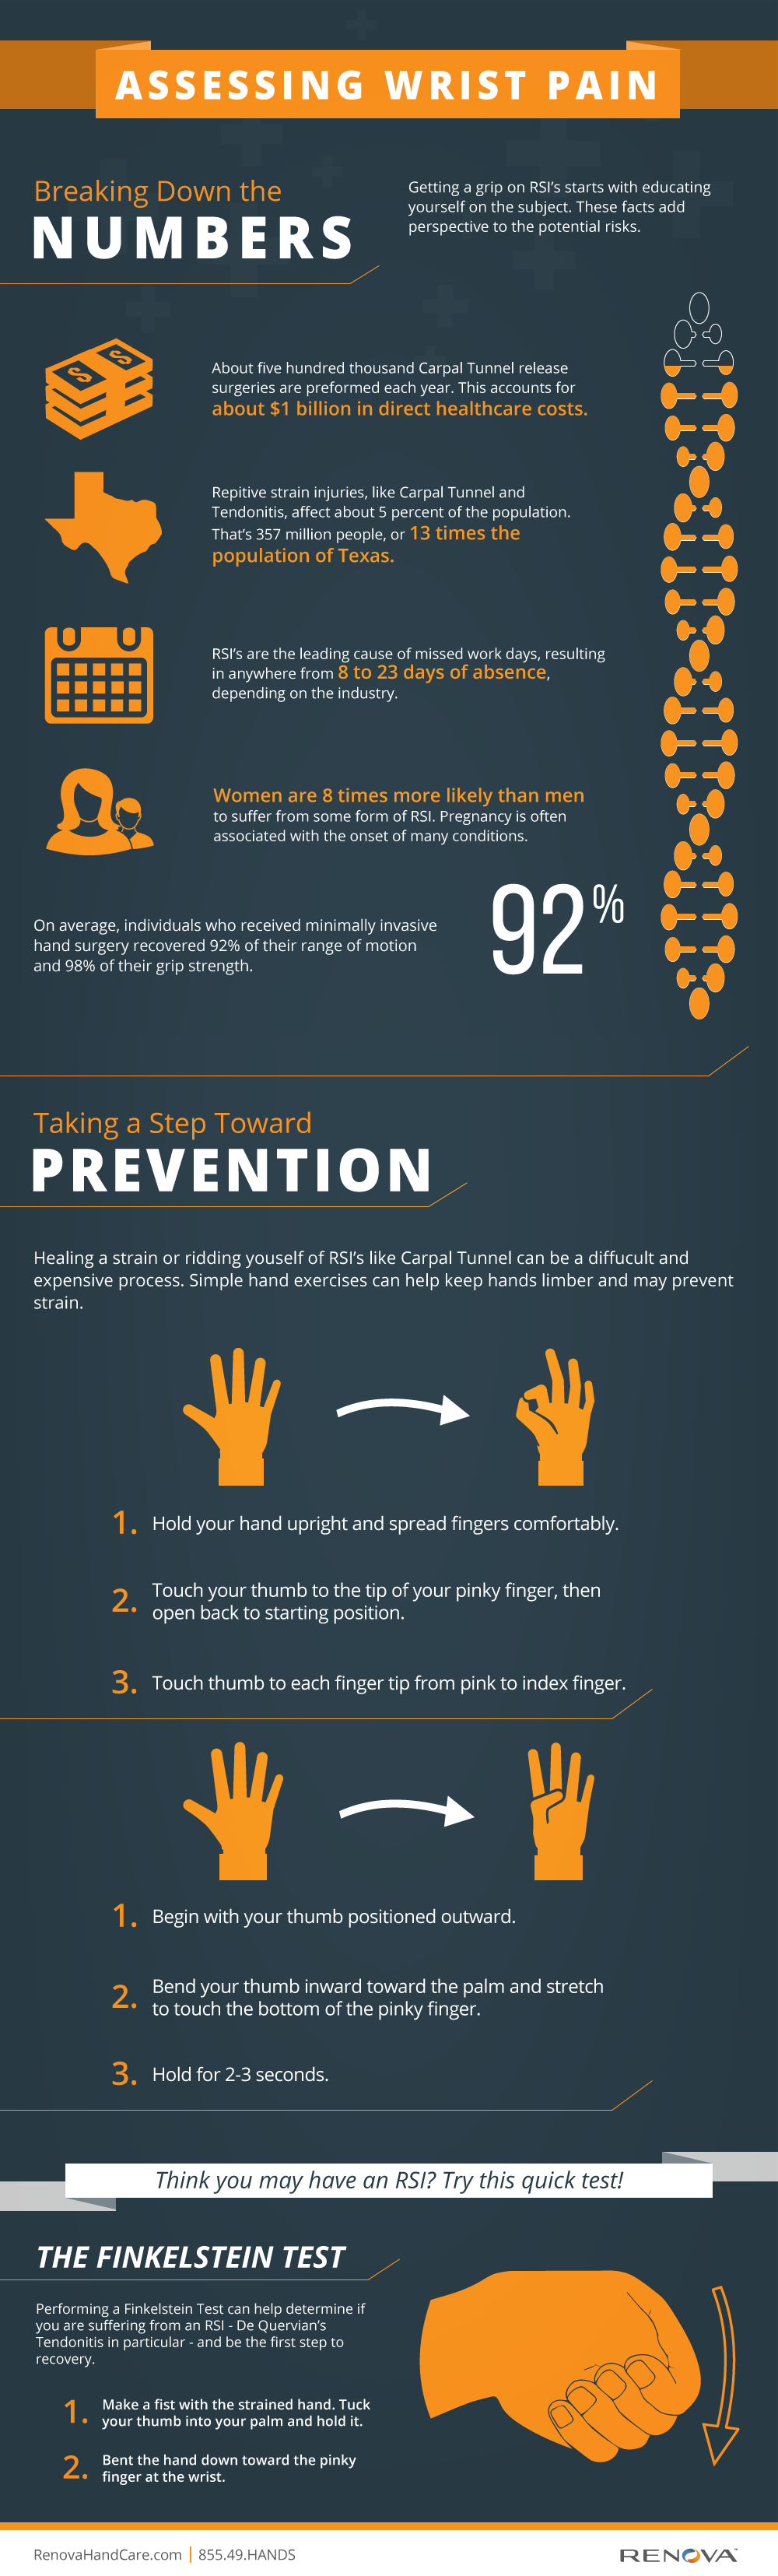 Assessing Wrist Pain